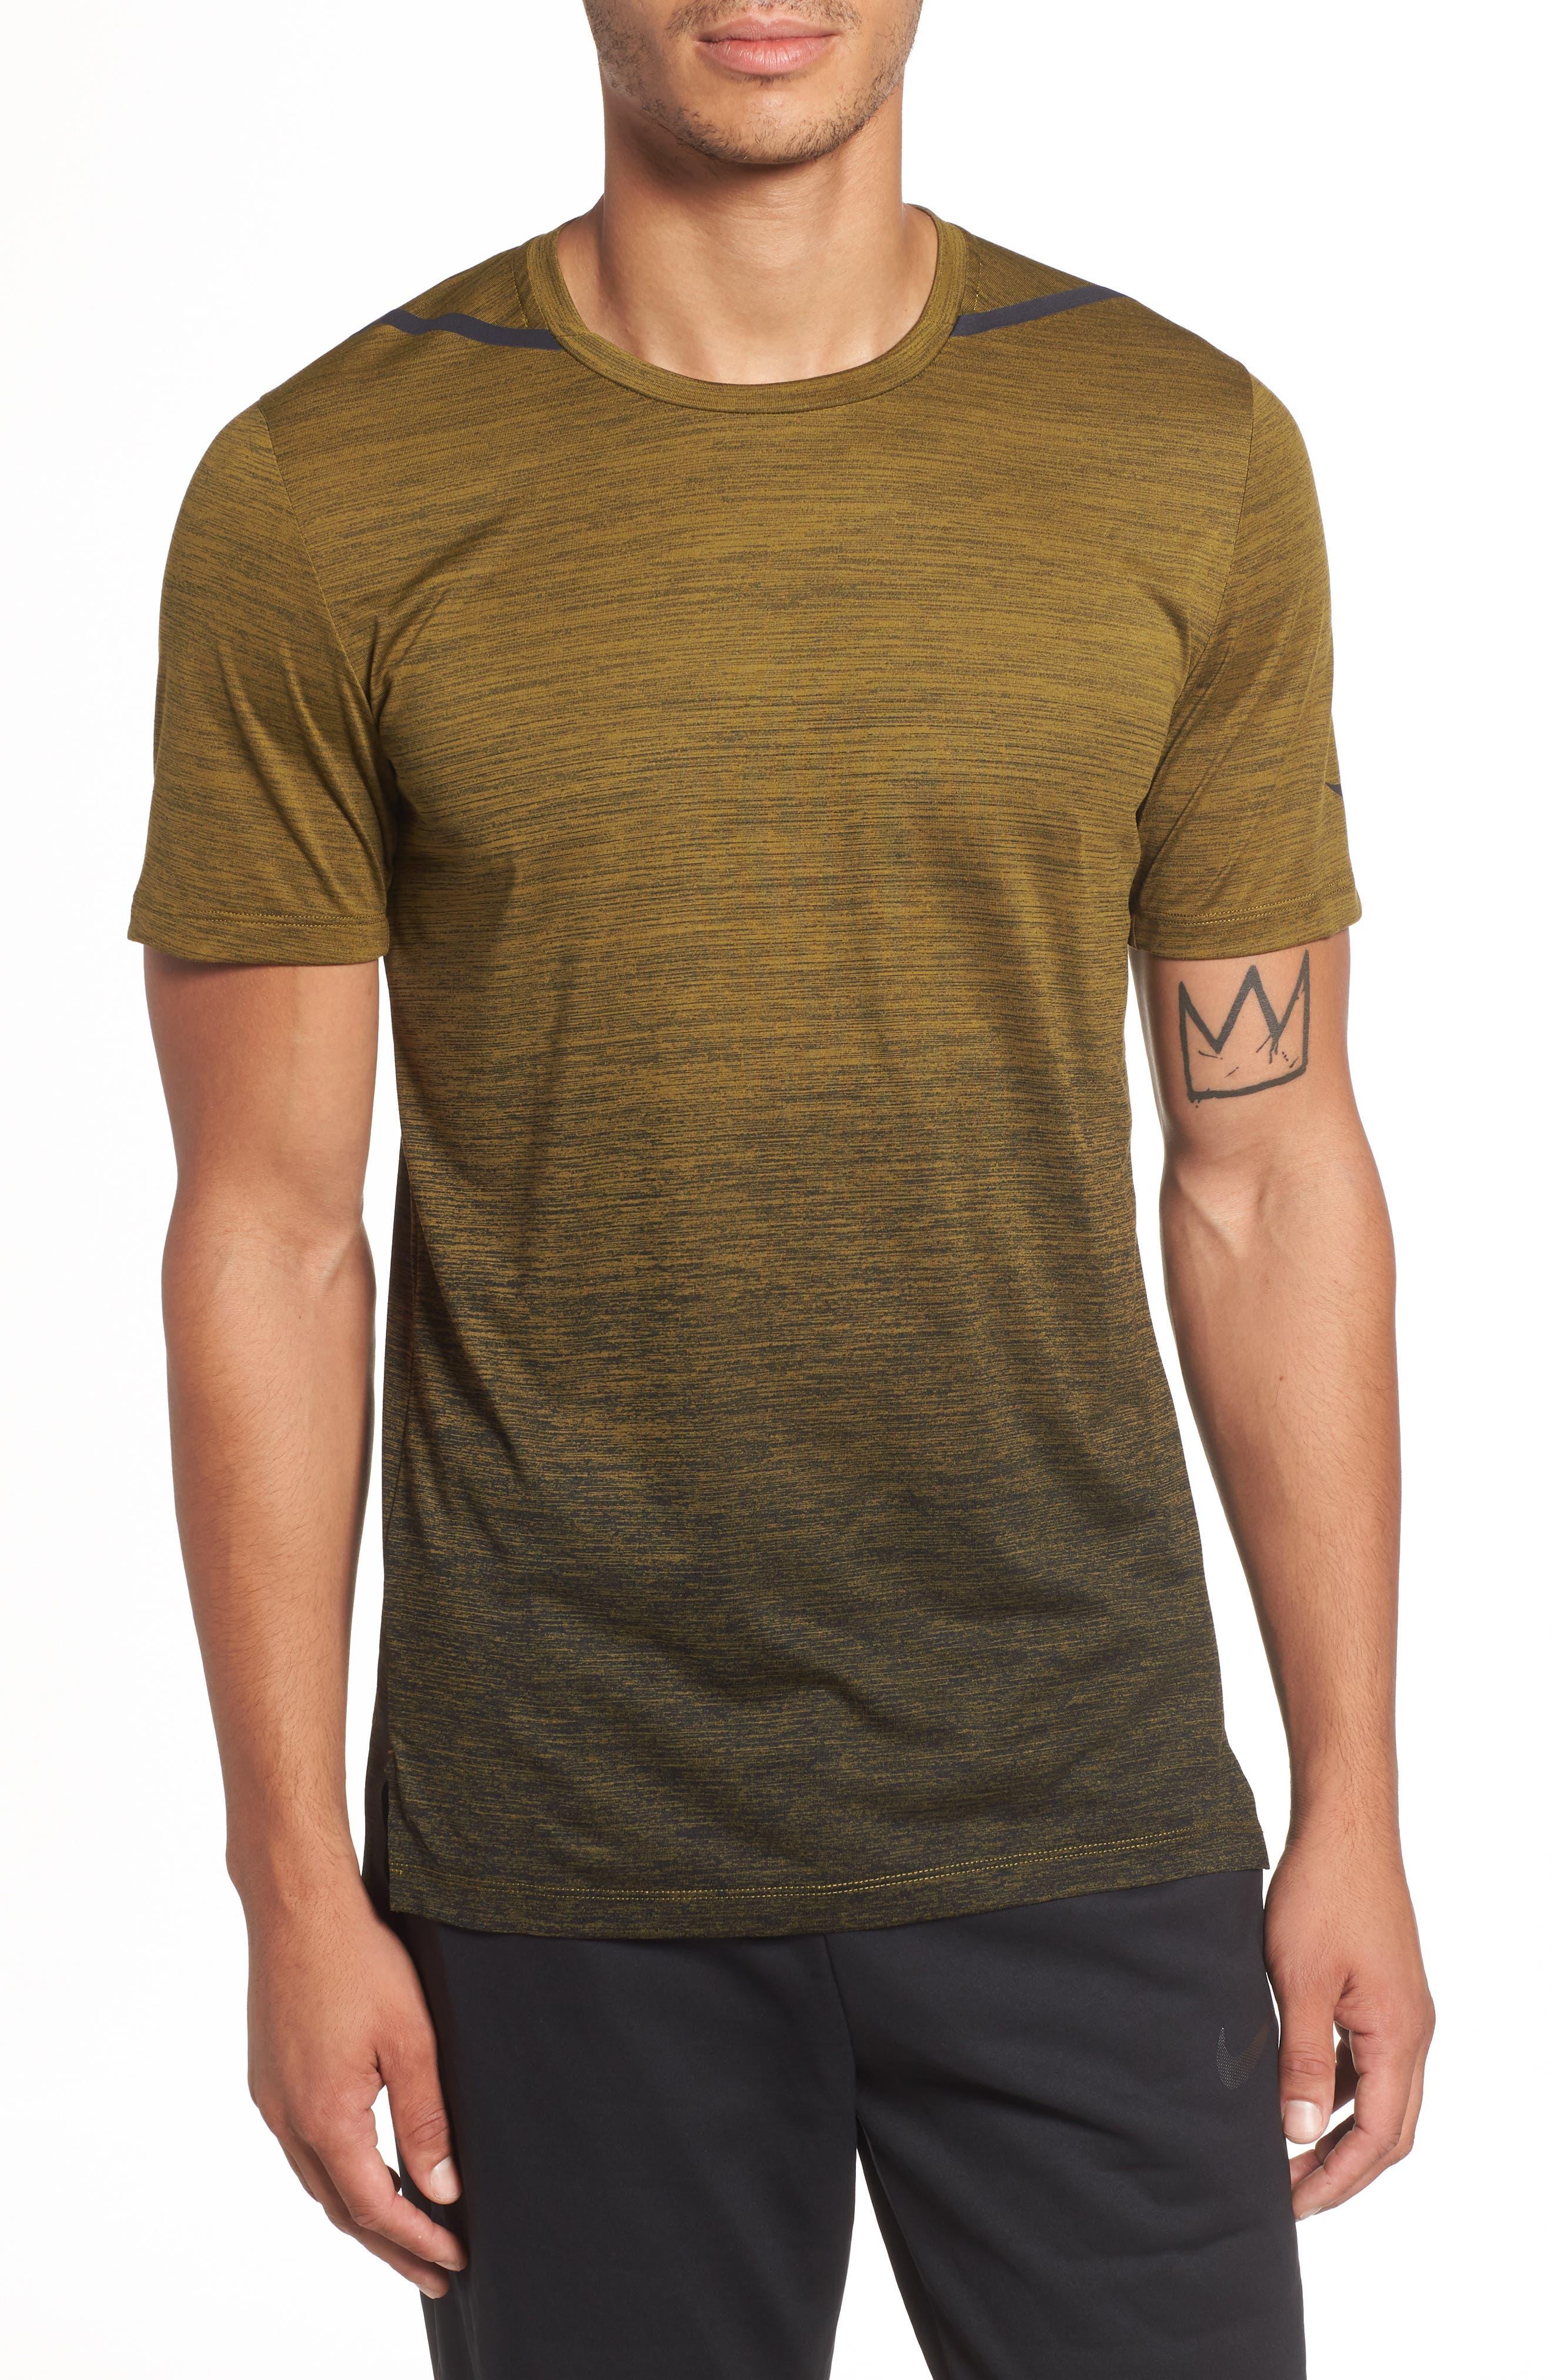 NIKE, Dry Max Training T-Shirt, Main thumbnail 1, color, OLIVE FLAK/ BLACK/ COBALT